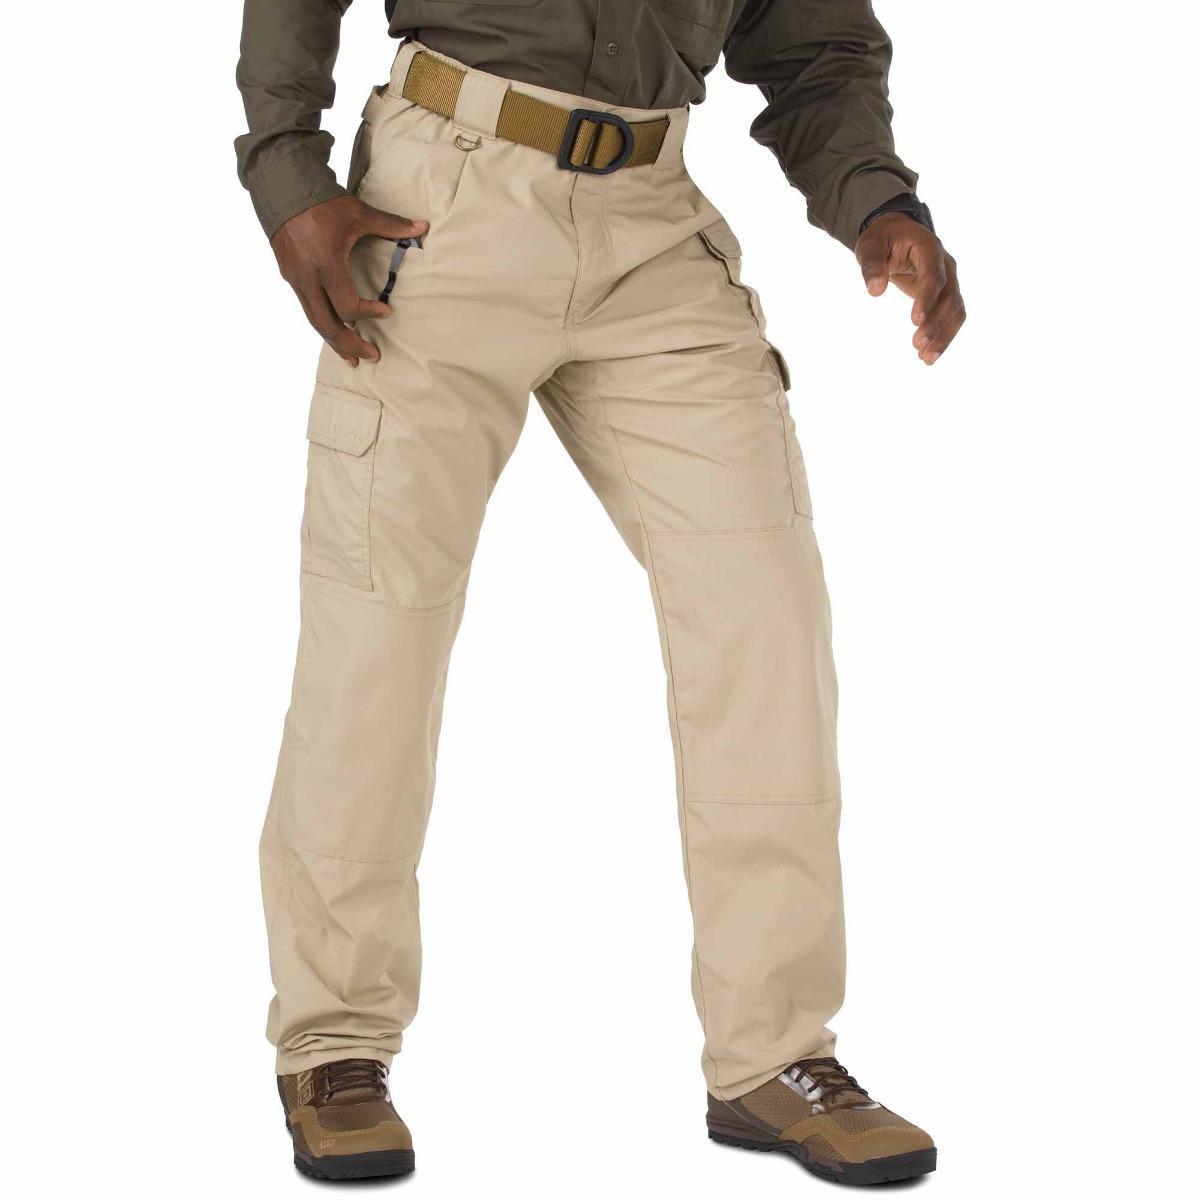 5 11 Pantalon Tactico Tdu Khaki Xl Regular Teflon Protect